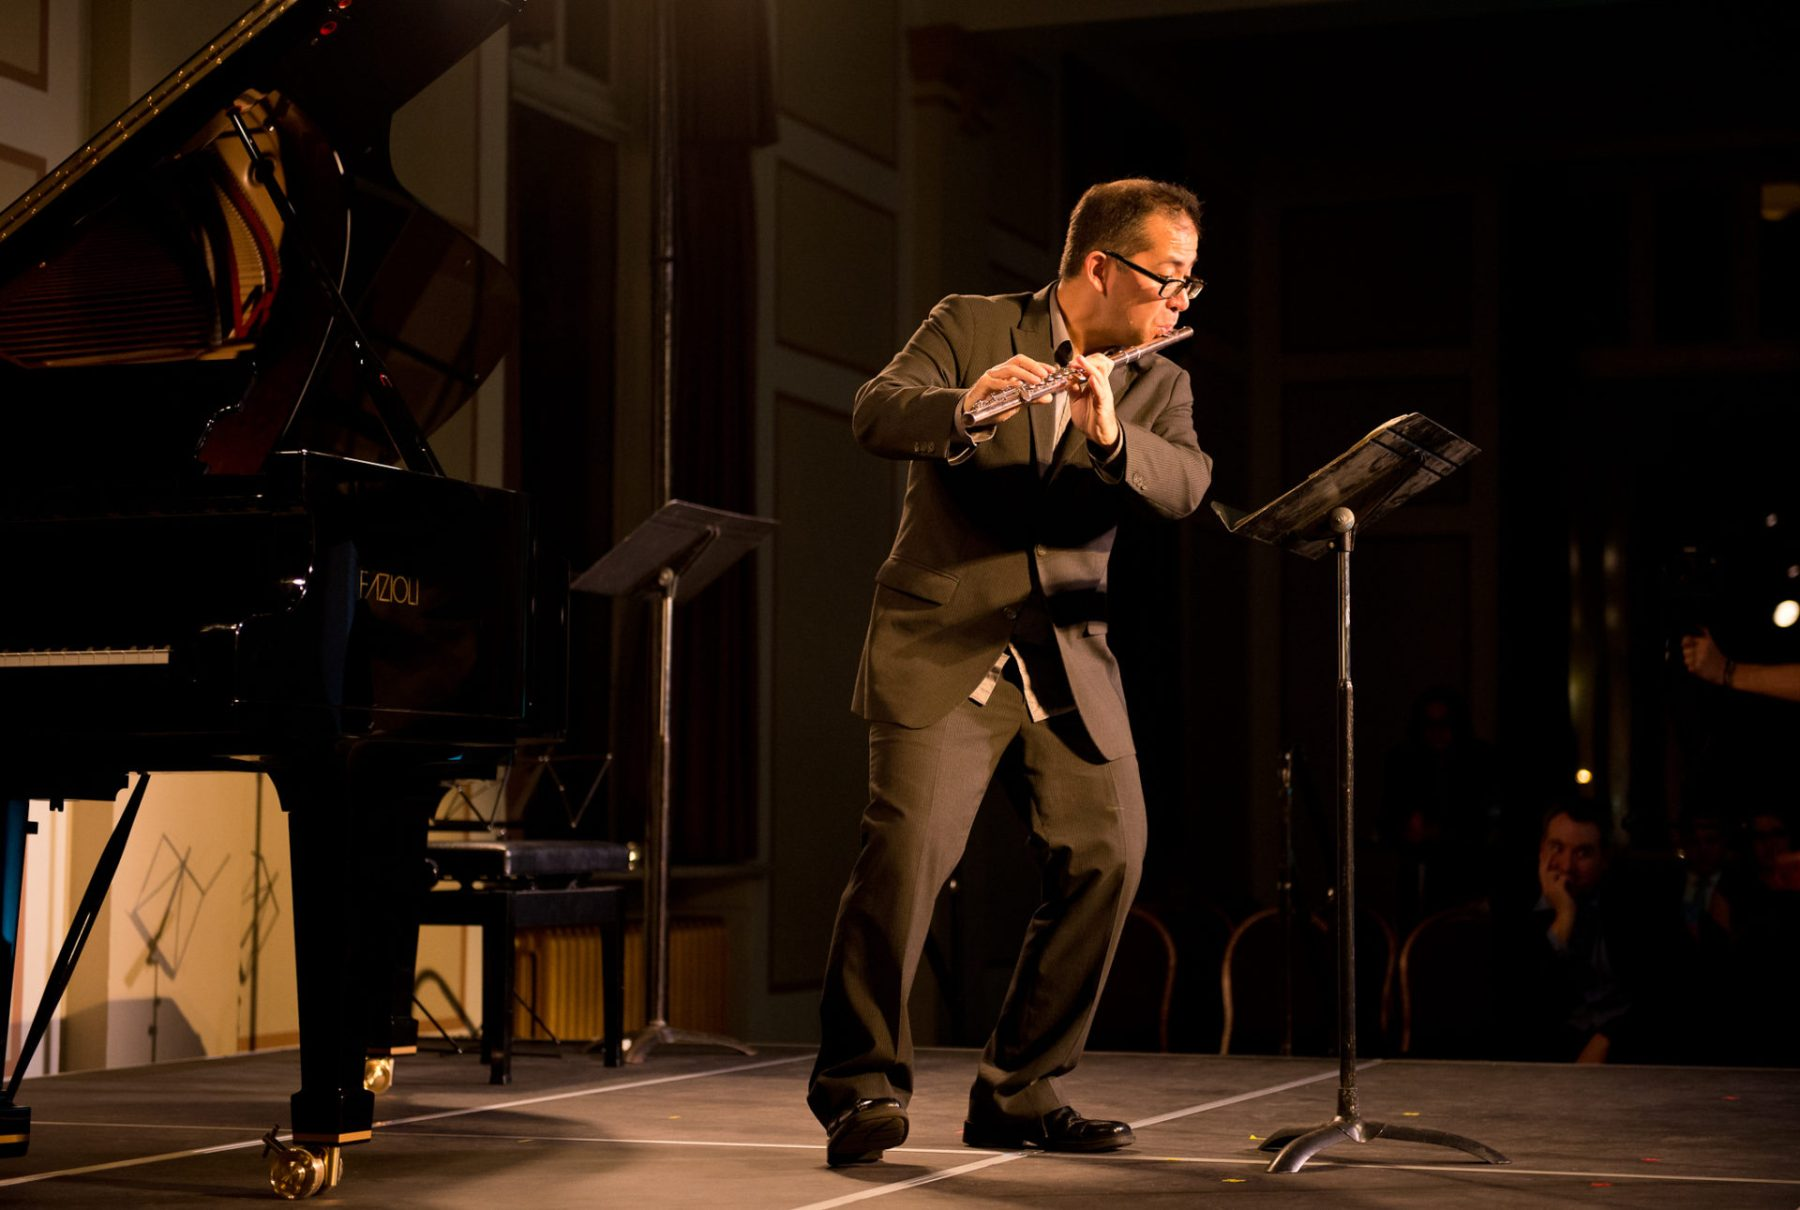 Mark Takeshi McGregor, Bach Party, Modulus Festival 2013